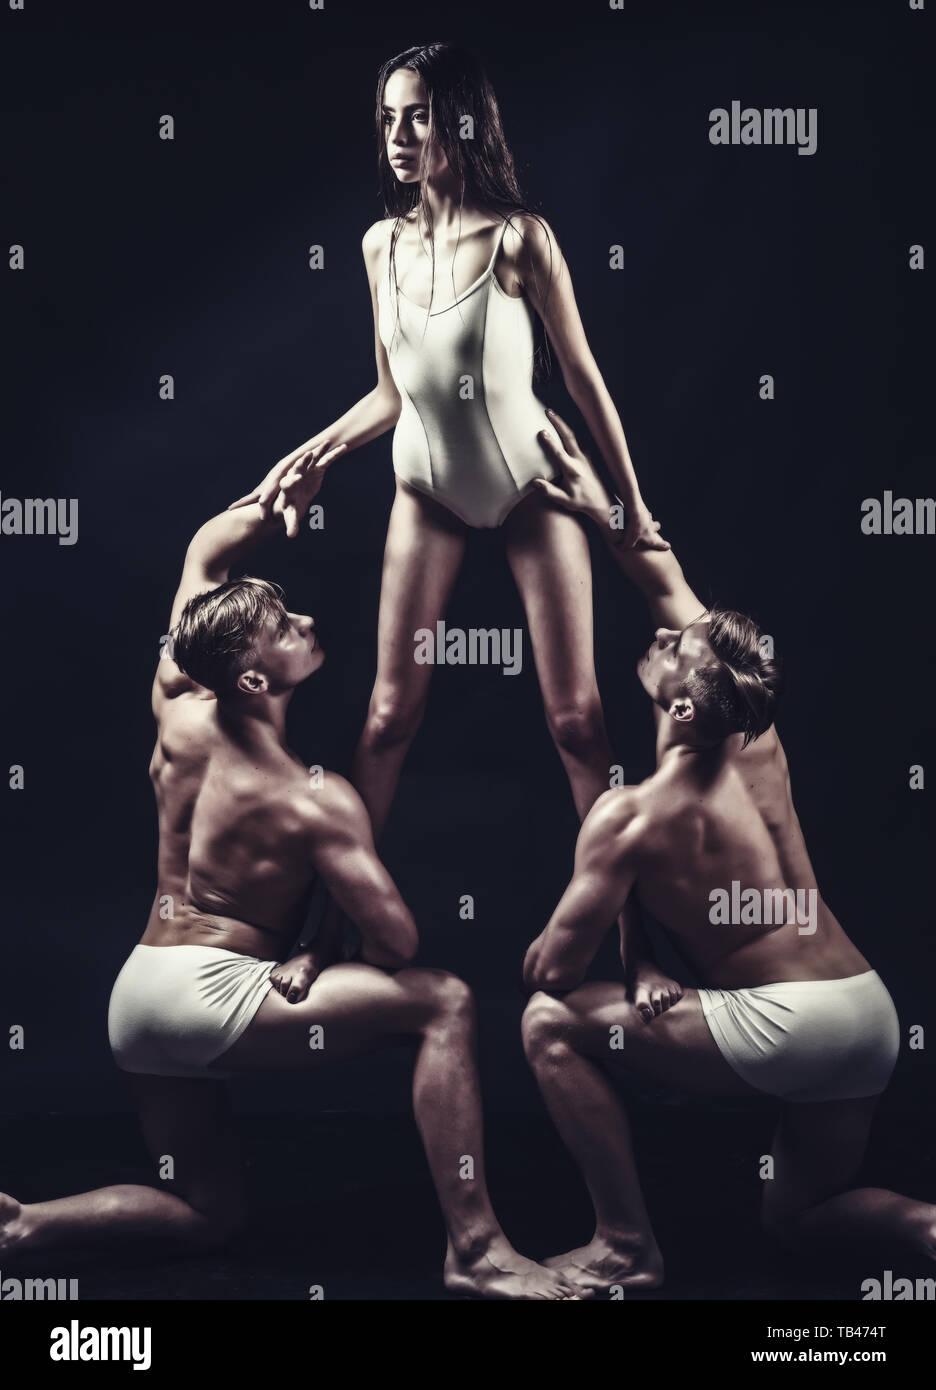 acrobatics workout of three friends. acrobatics people train in white sportswear. - Stock Image